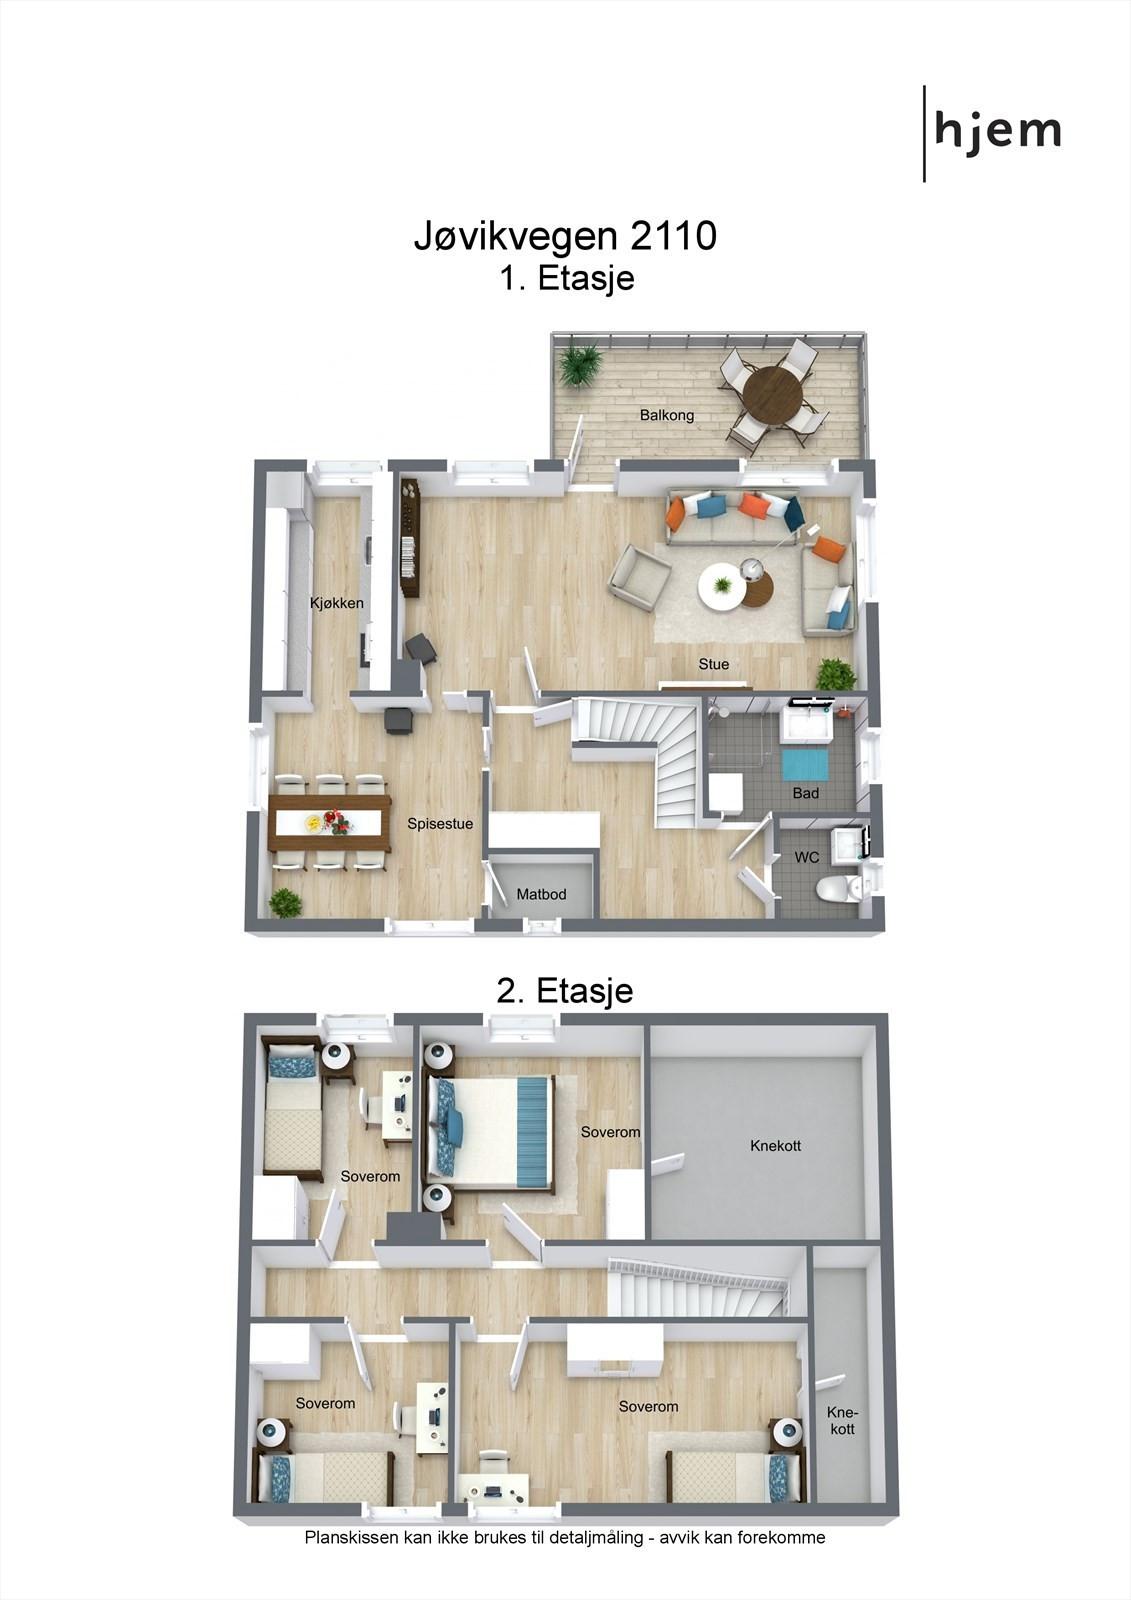 Project letterhead - Jøvikvegen 2110 - 3D Floor Plan